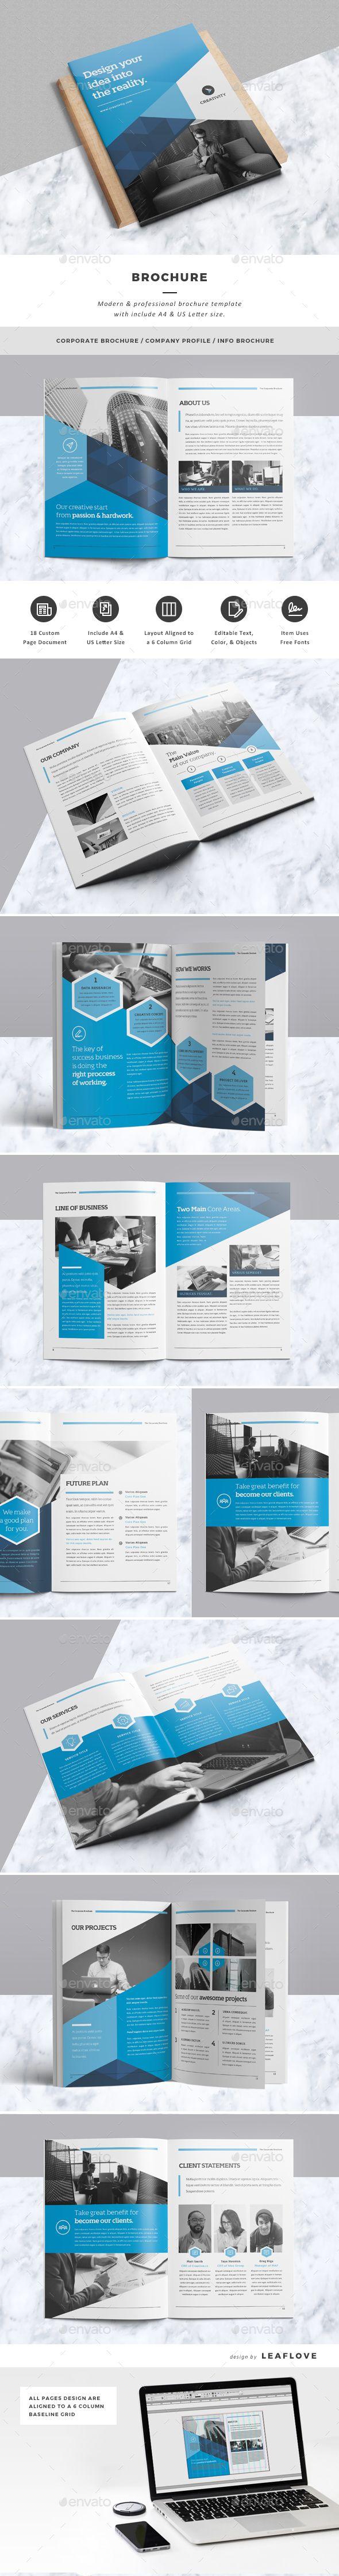 Corporate Brochure Design Template - Corporate Brochure Template InDesign INDD. Download here: https://graphicriver.net/item/brochure/17363666?ref=yinkira